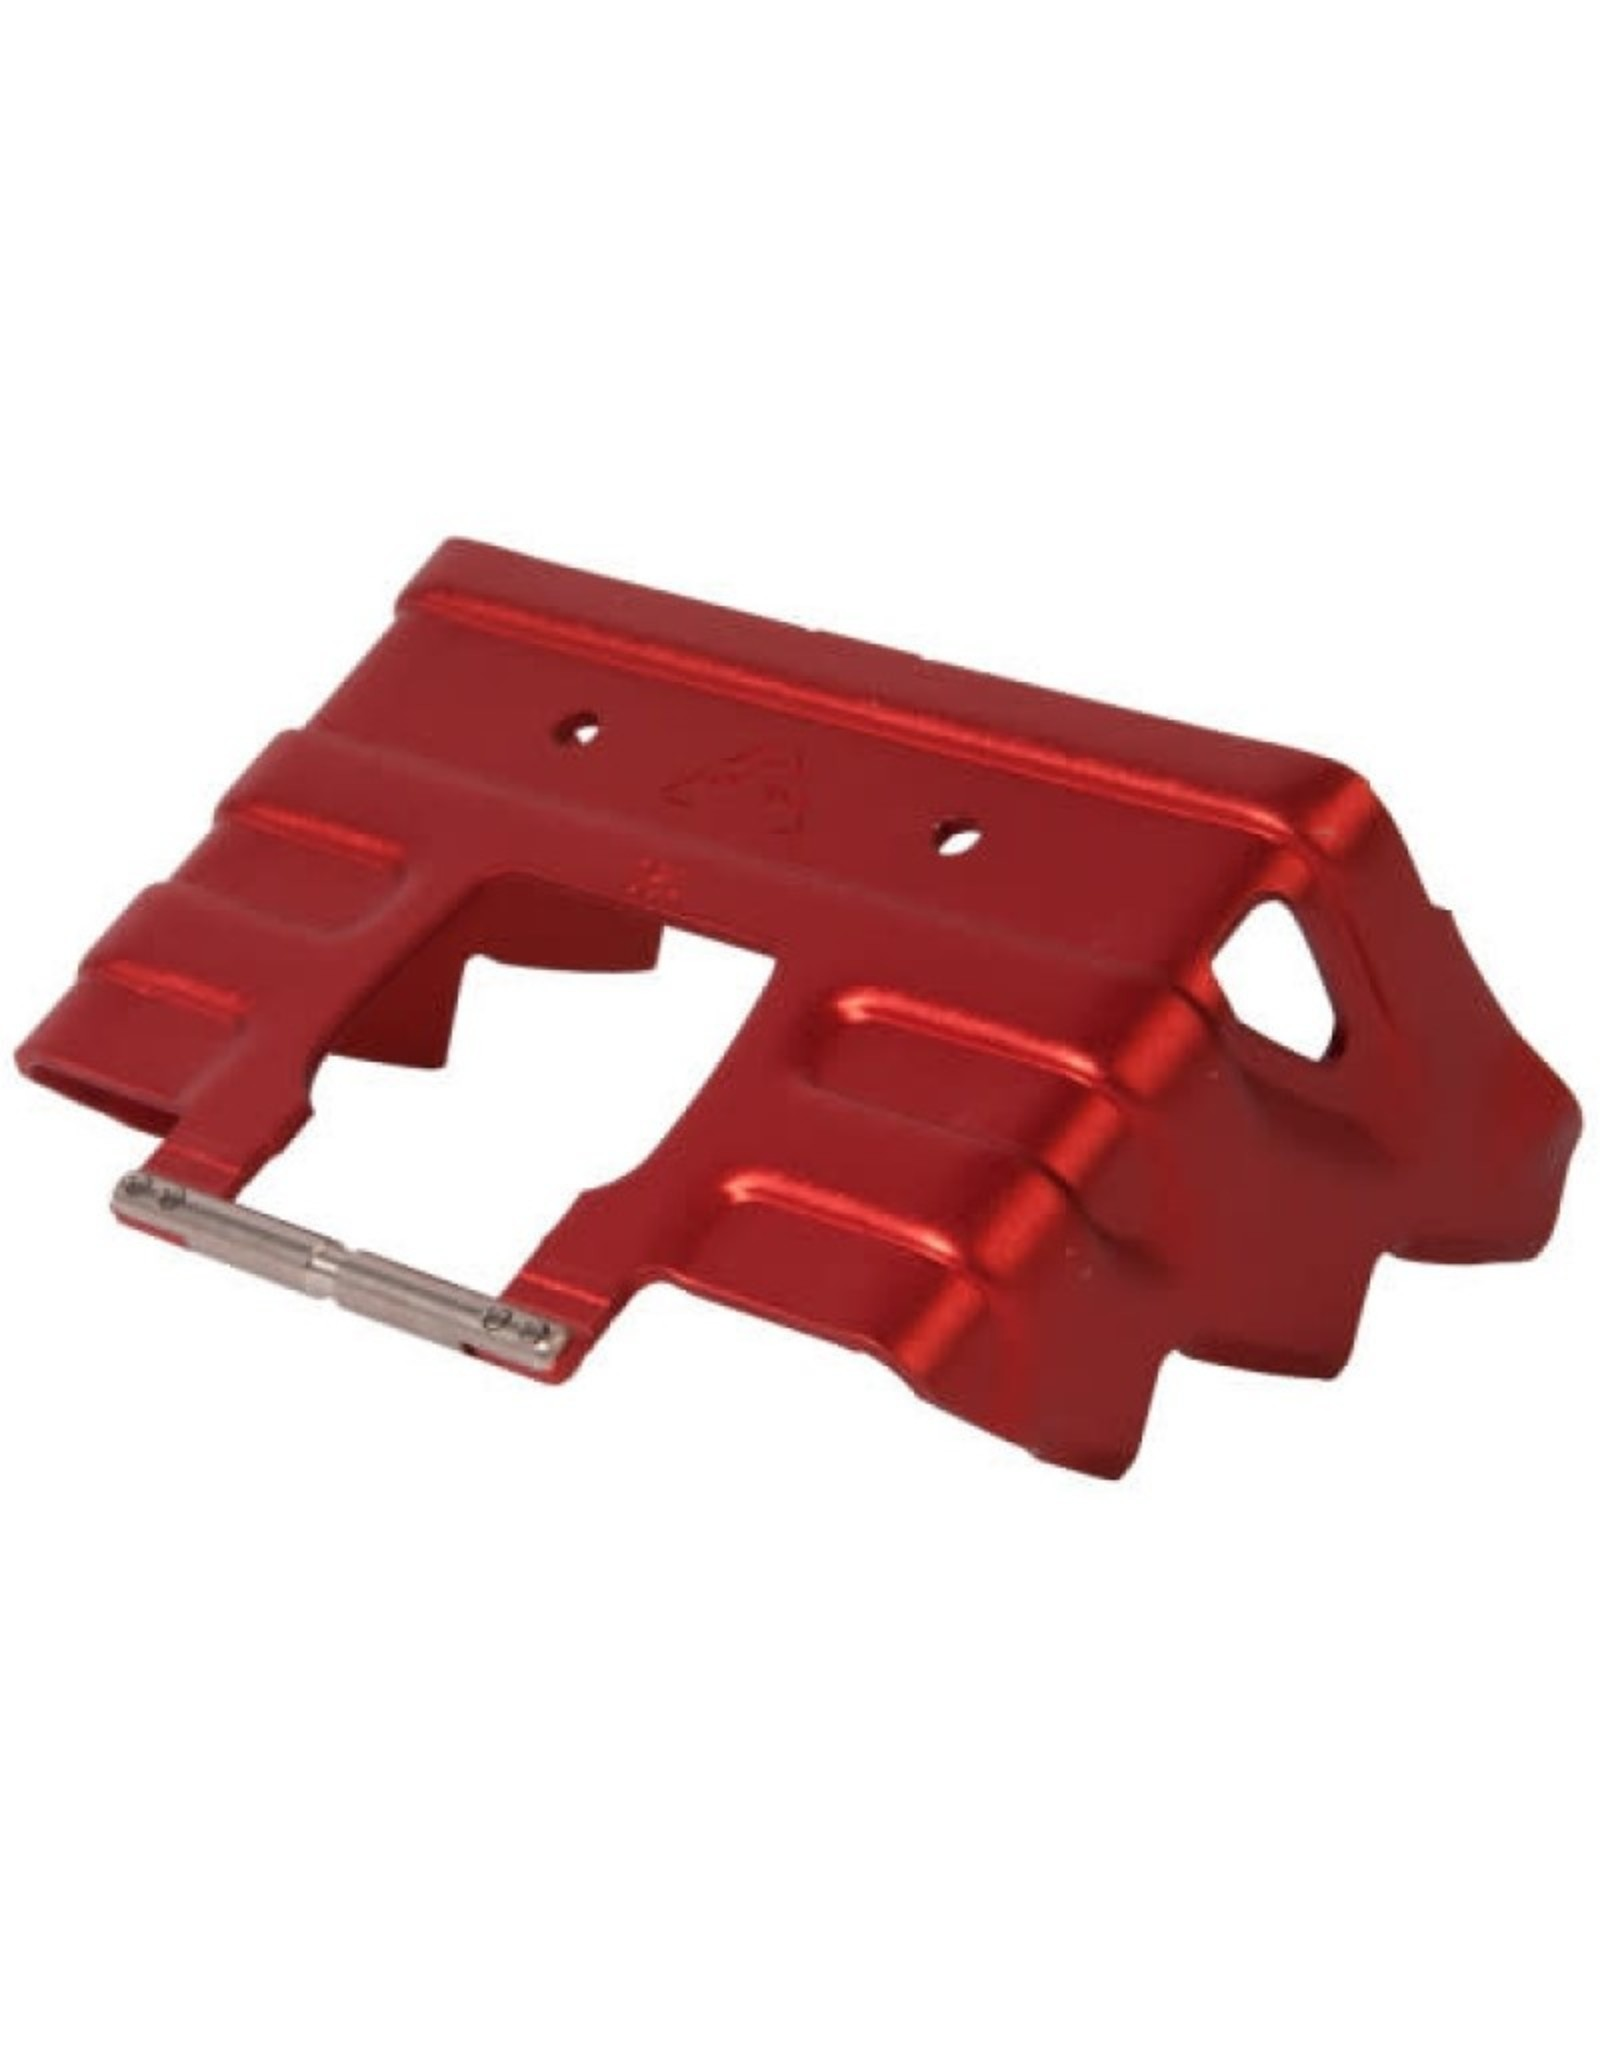 Dynafit Crampons 120mm Red